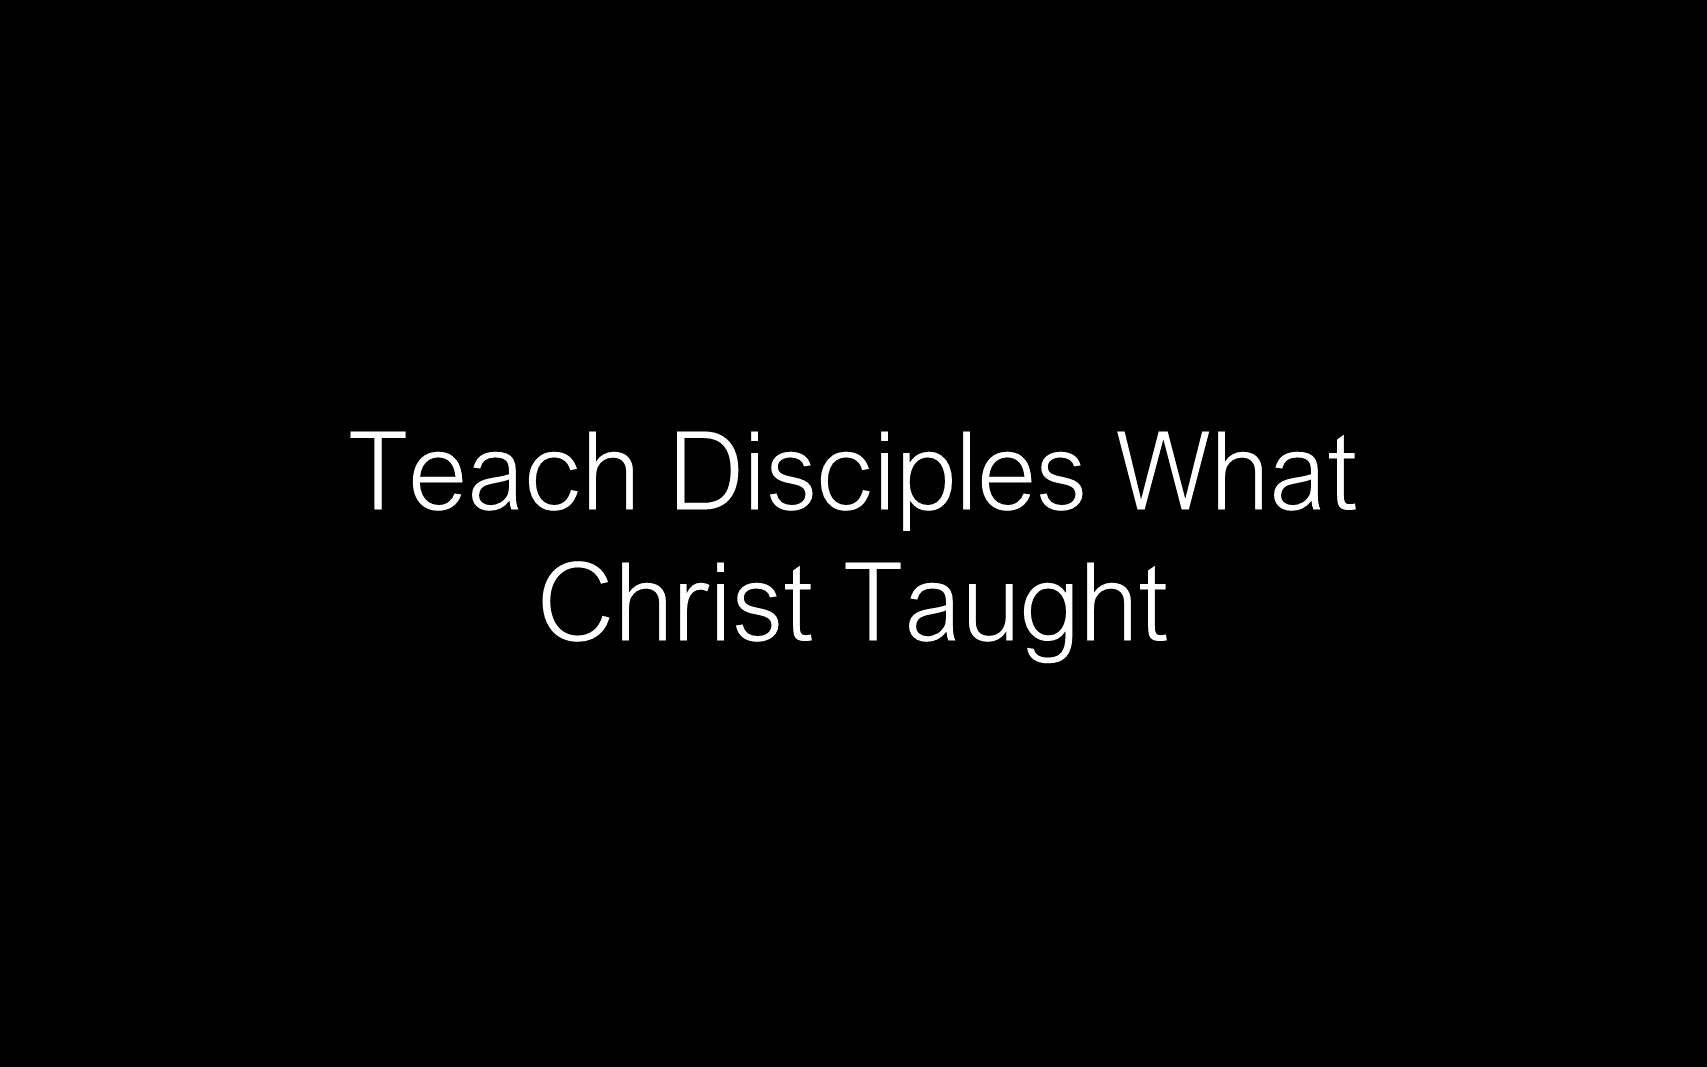 ESH-11 - The Discipline Of Disciple-Making - Disciples - Follow Christ & Make Disciples (14)